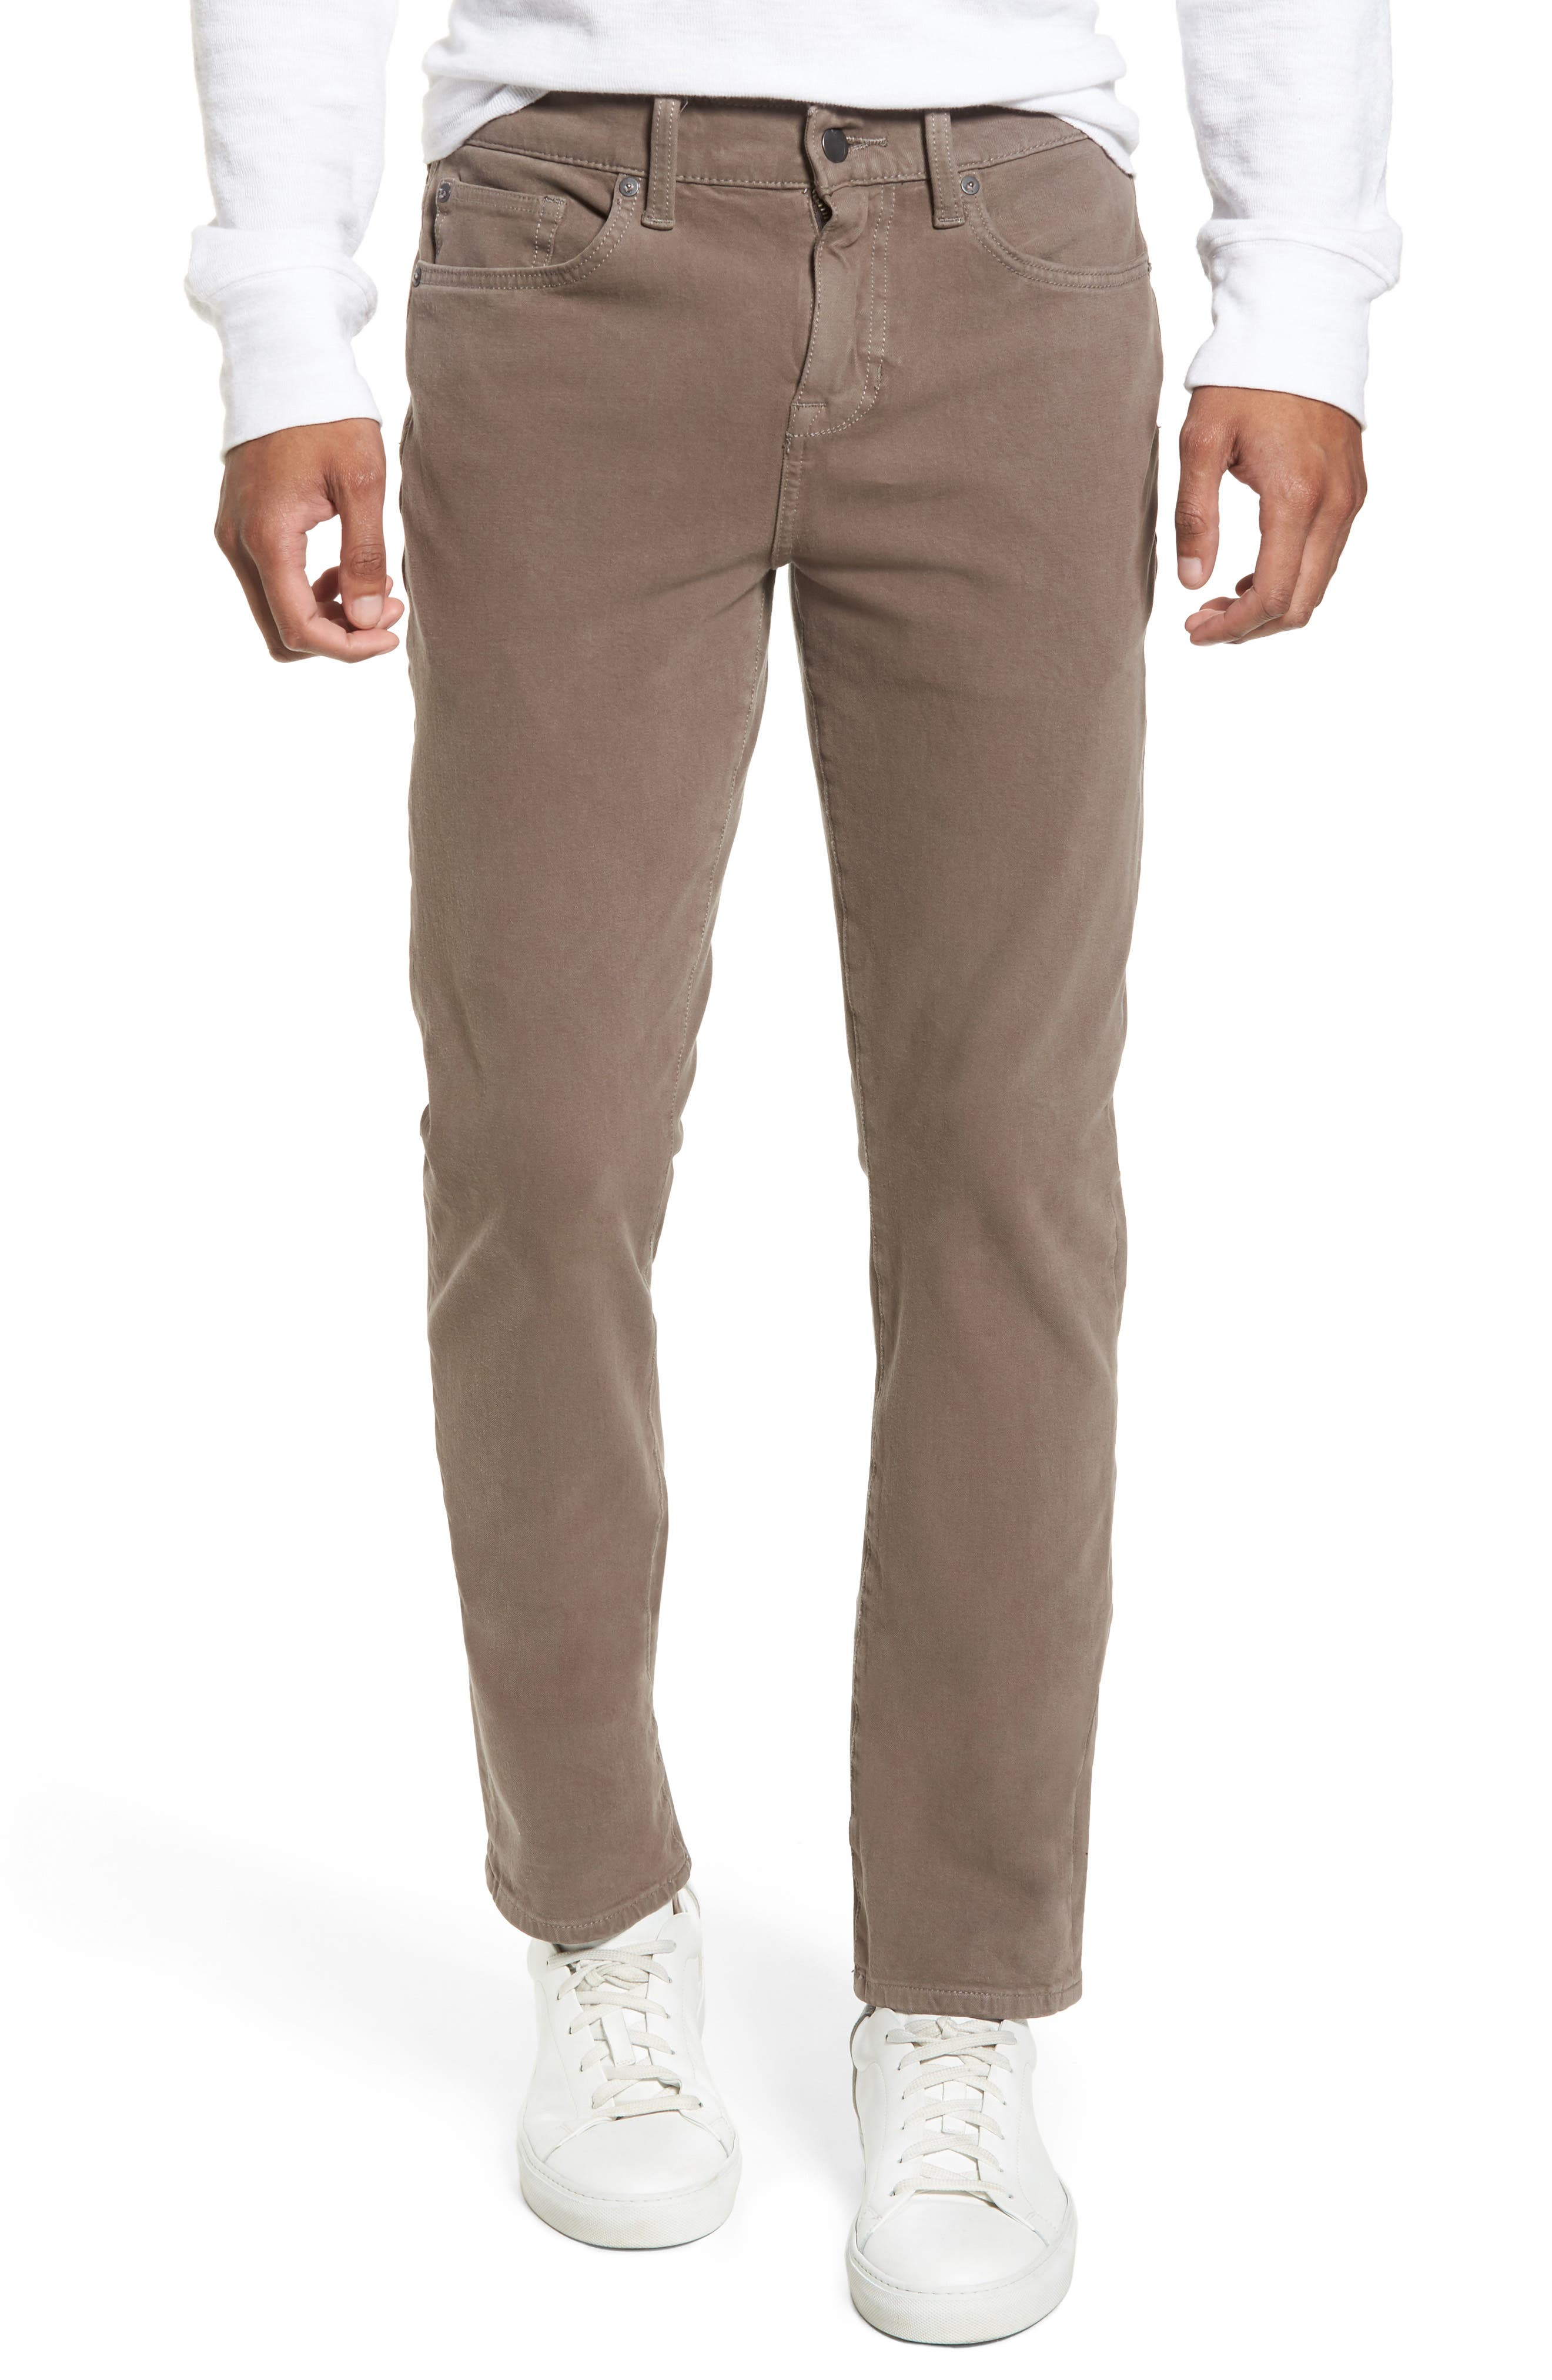 Kinetic Slim Fit Jeans,                             Main thumbnail 1, color,                             Stonehenge